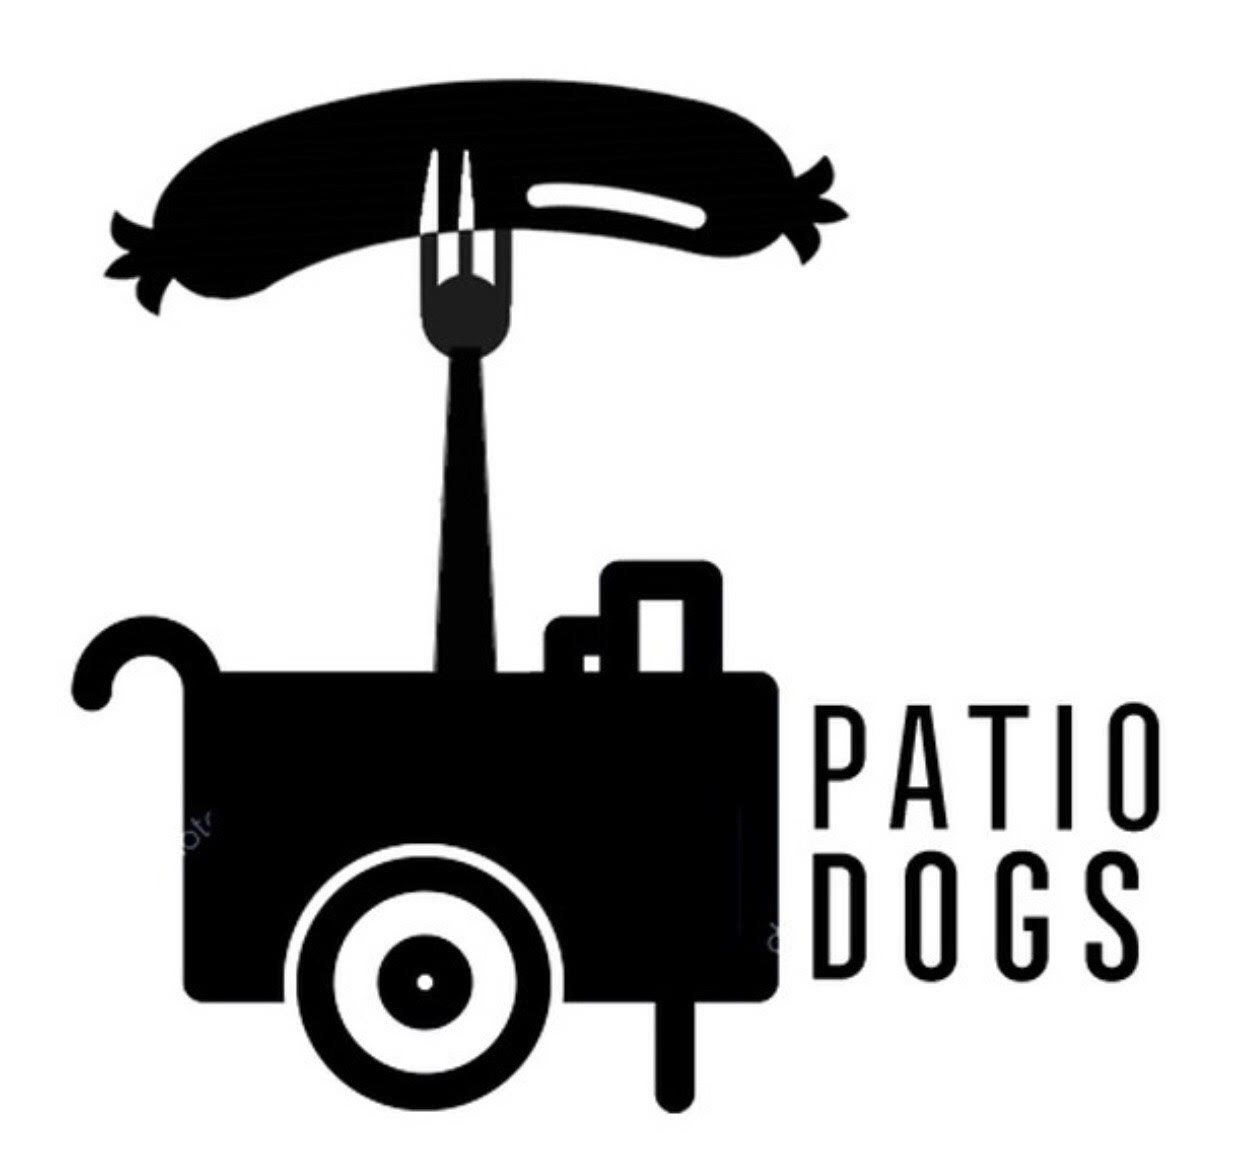 patiodogs.jpg